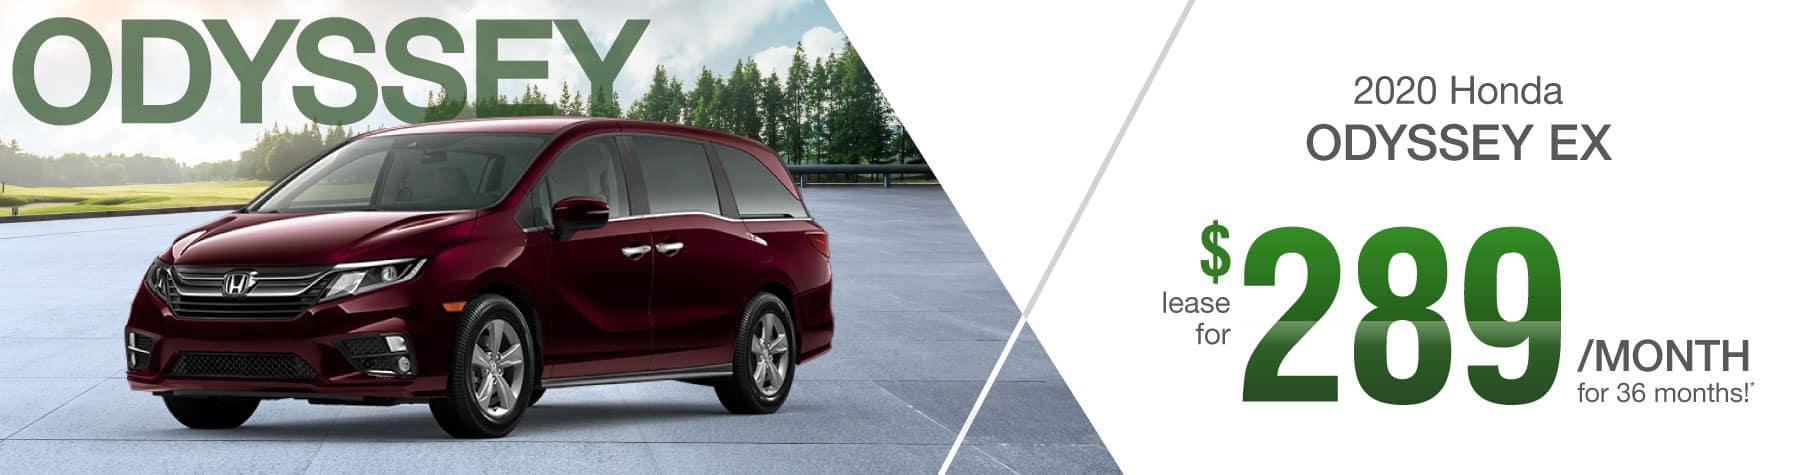 Header Photo of the 2020 Honda Odyssey